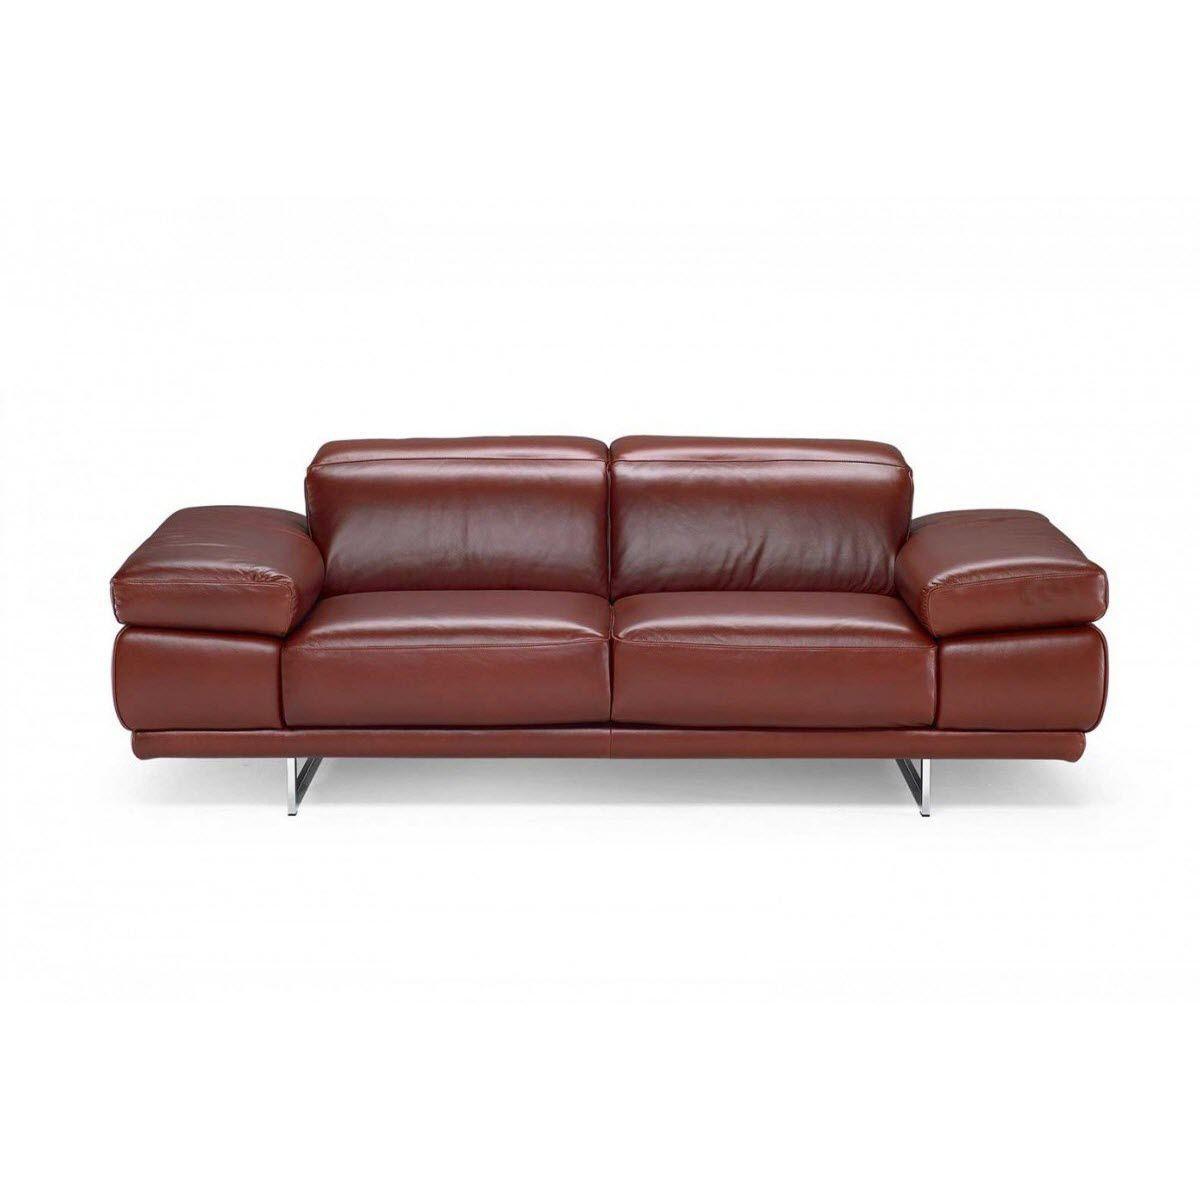 Sensational Modular Sofa Contemporary Leather Fabric Preludio Alphanode Cool Chair Designs And Ideas Alphanodeonline